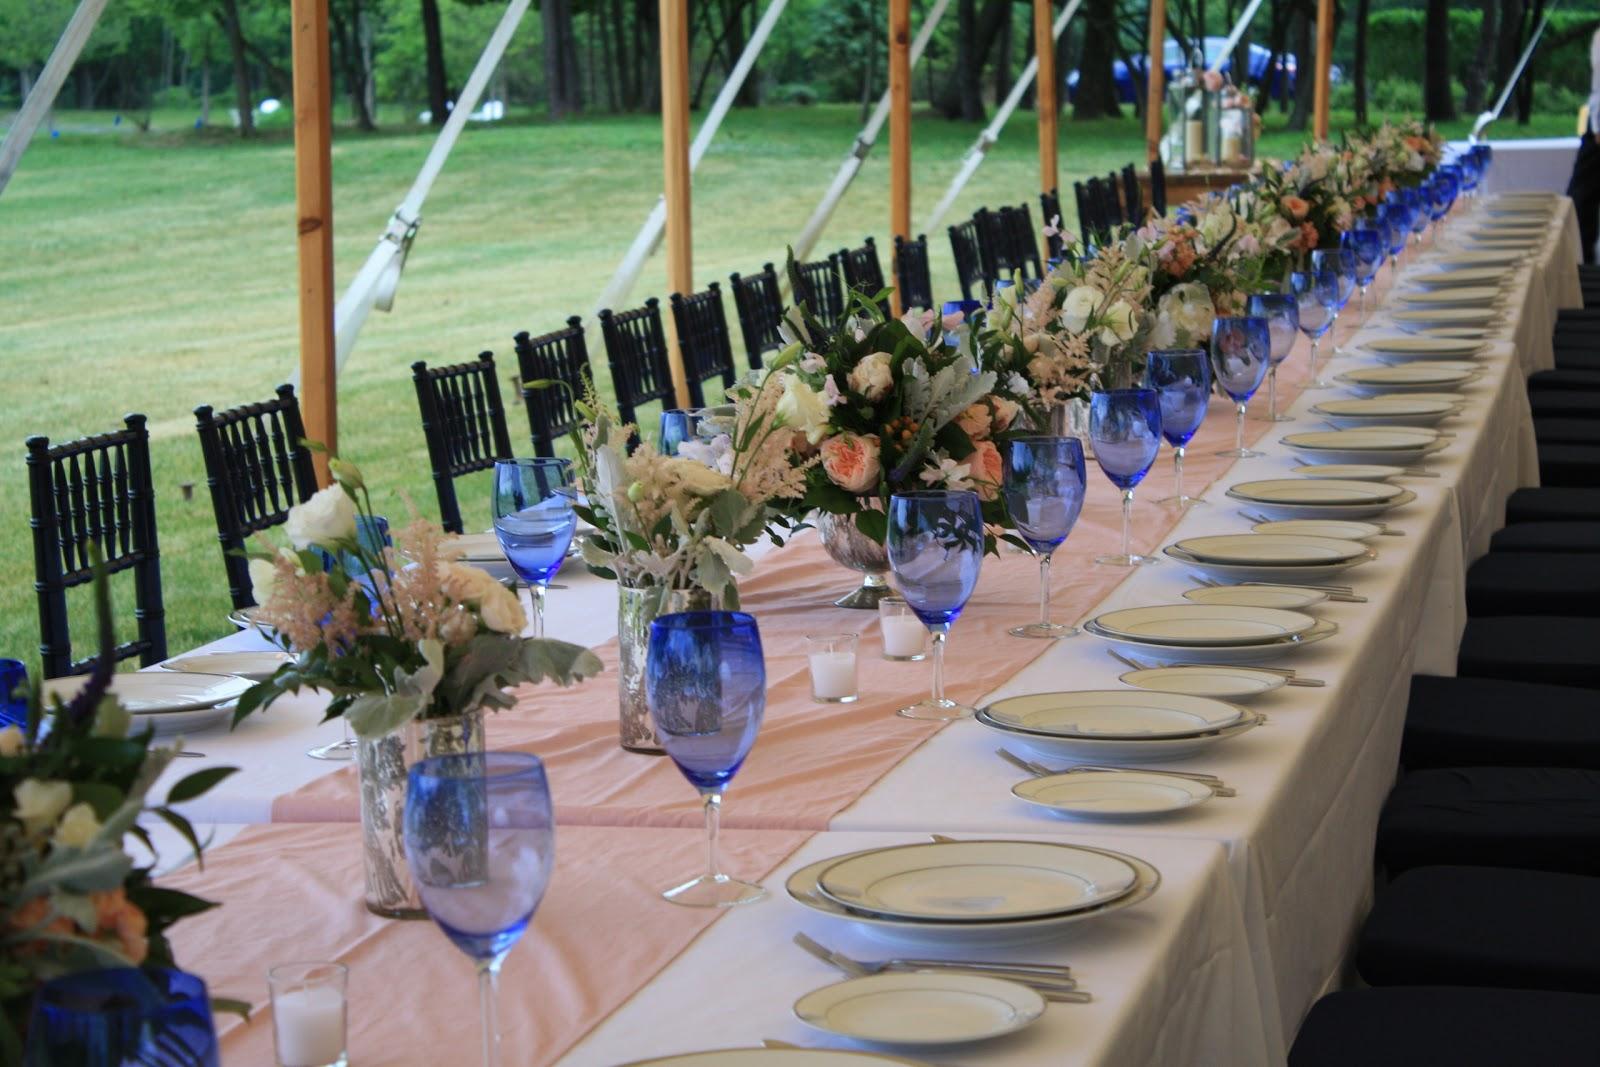 Long Table Centerpieces Glenmere Mansion Wedding Splendid Stems Fl Designs